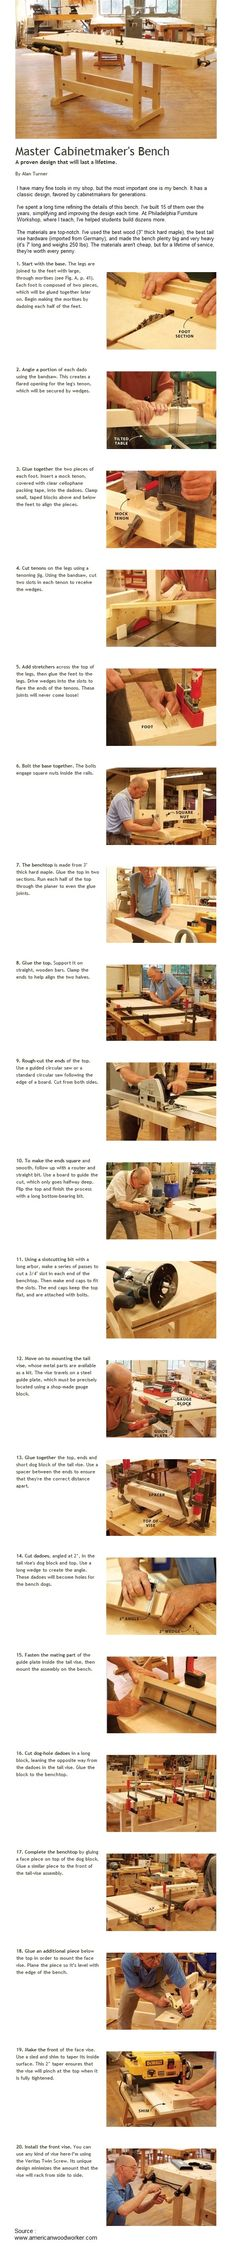 +Master+Cabinetmaker's+Bench+|+WoodworkerZ.com